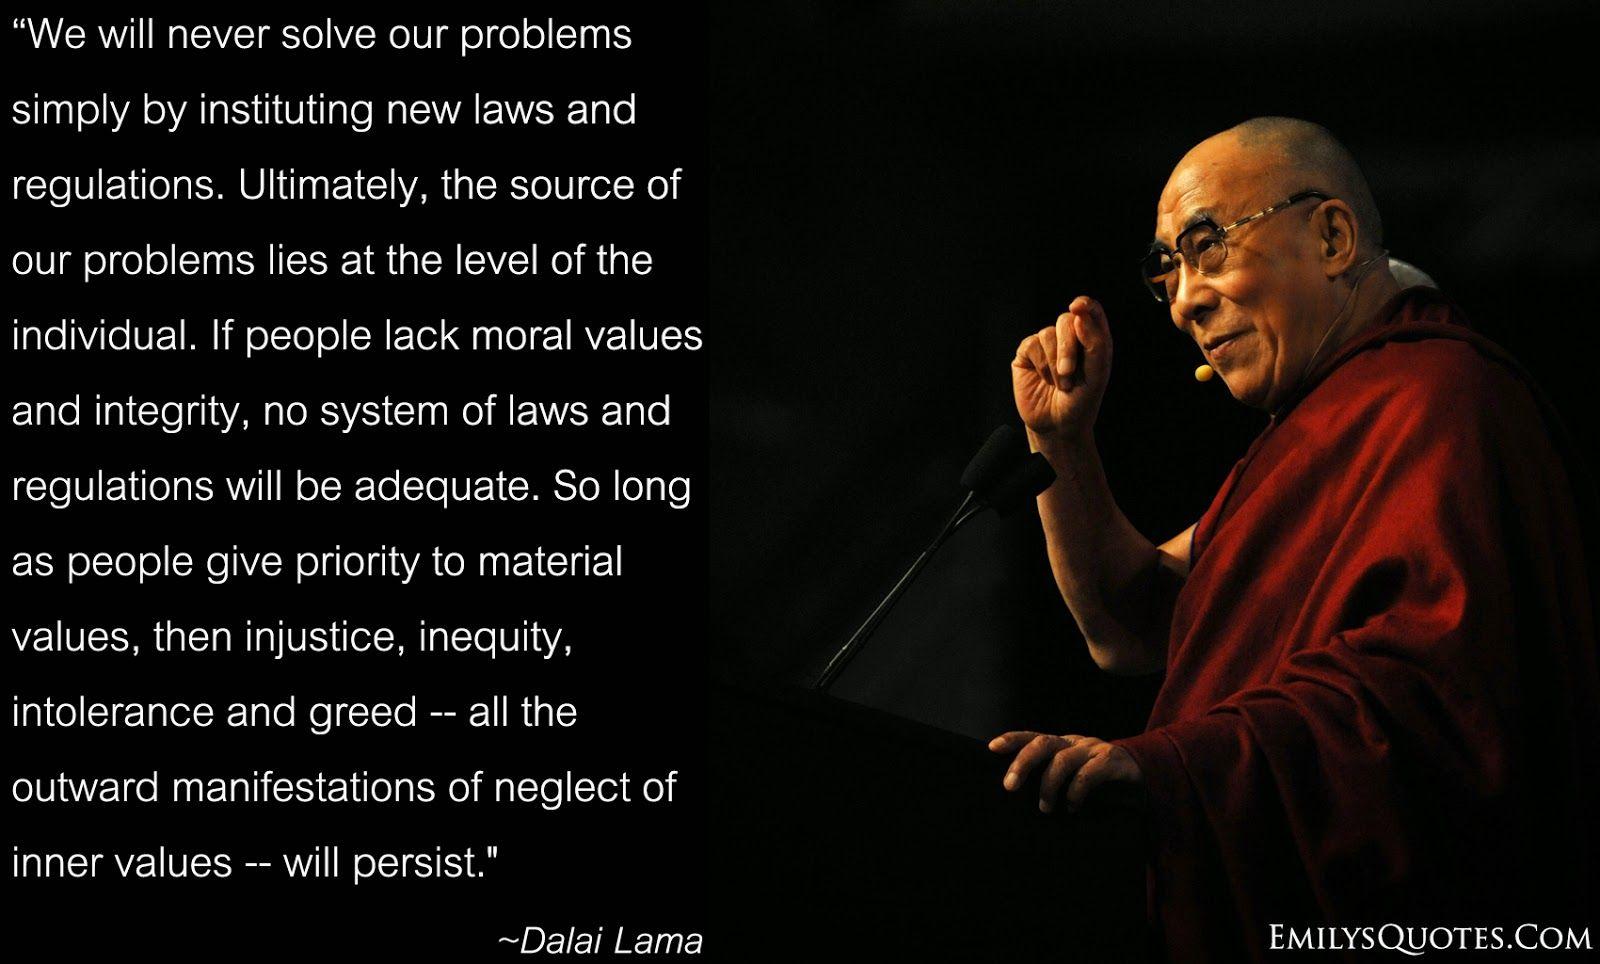 Dalai Lama Wisdom Quotes